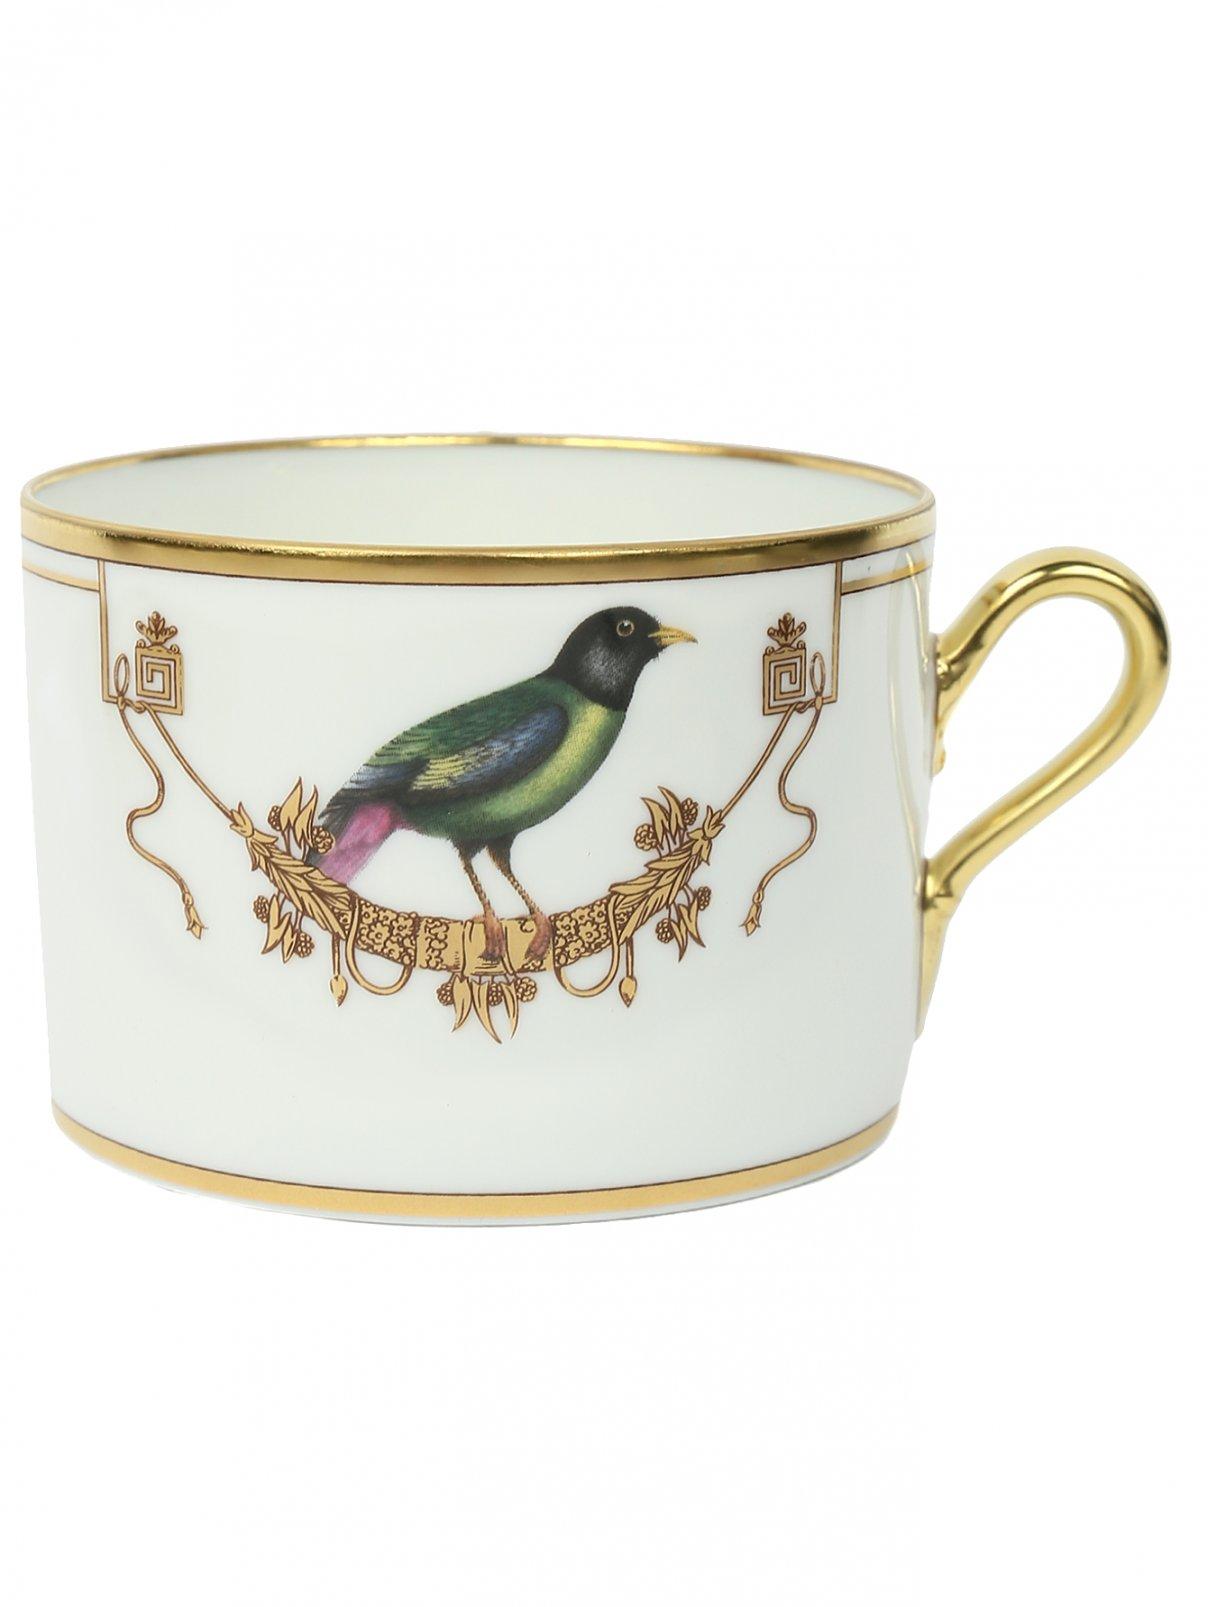 Чашка чайная с узором Richard Ginori 1735  –  Общий вид